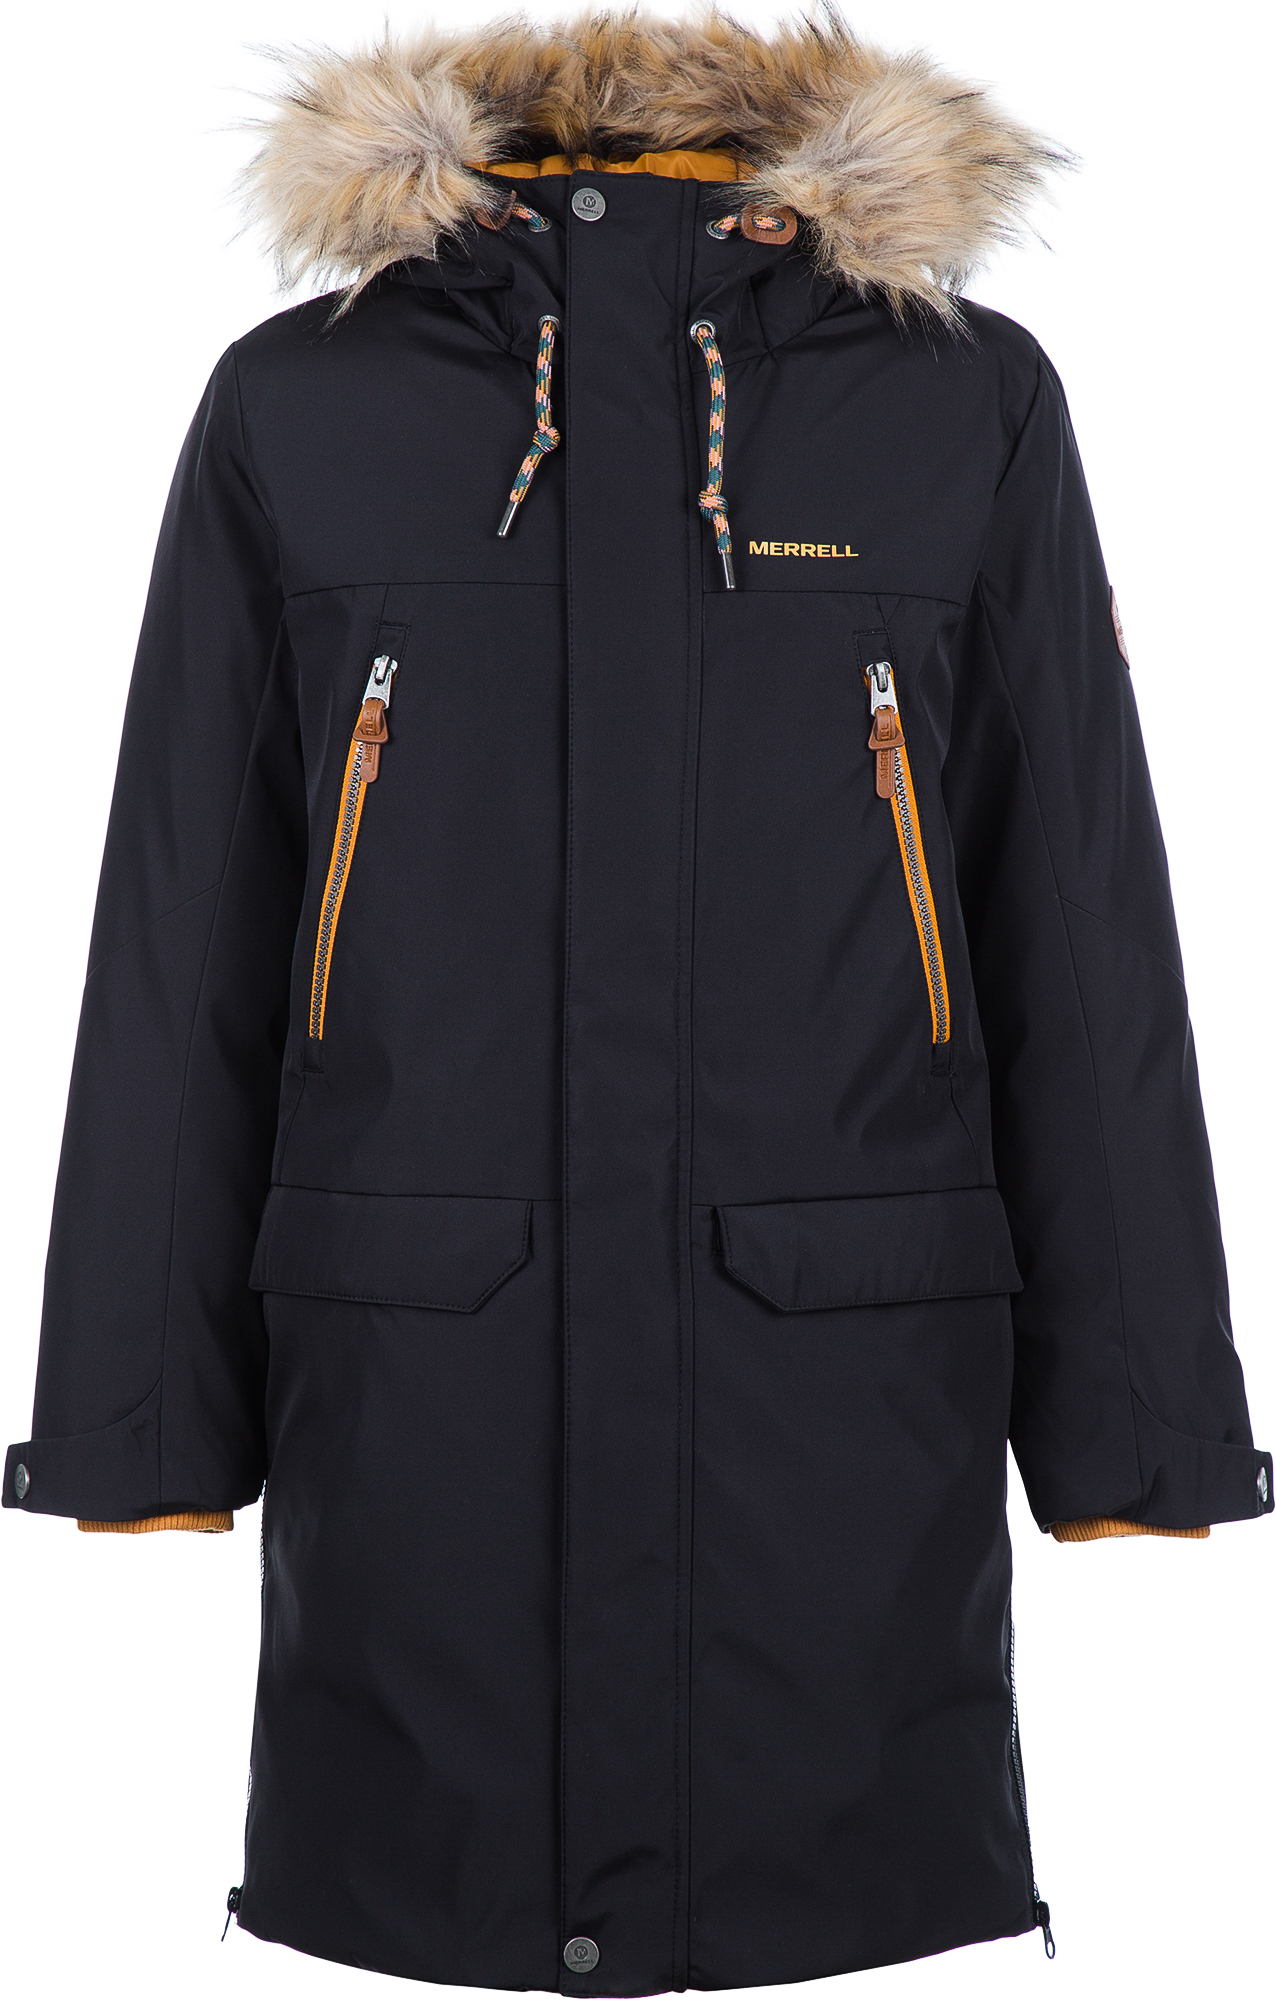 Merrell Куртка утепленная для мальчиков Merrell, размер 164